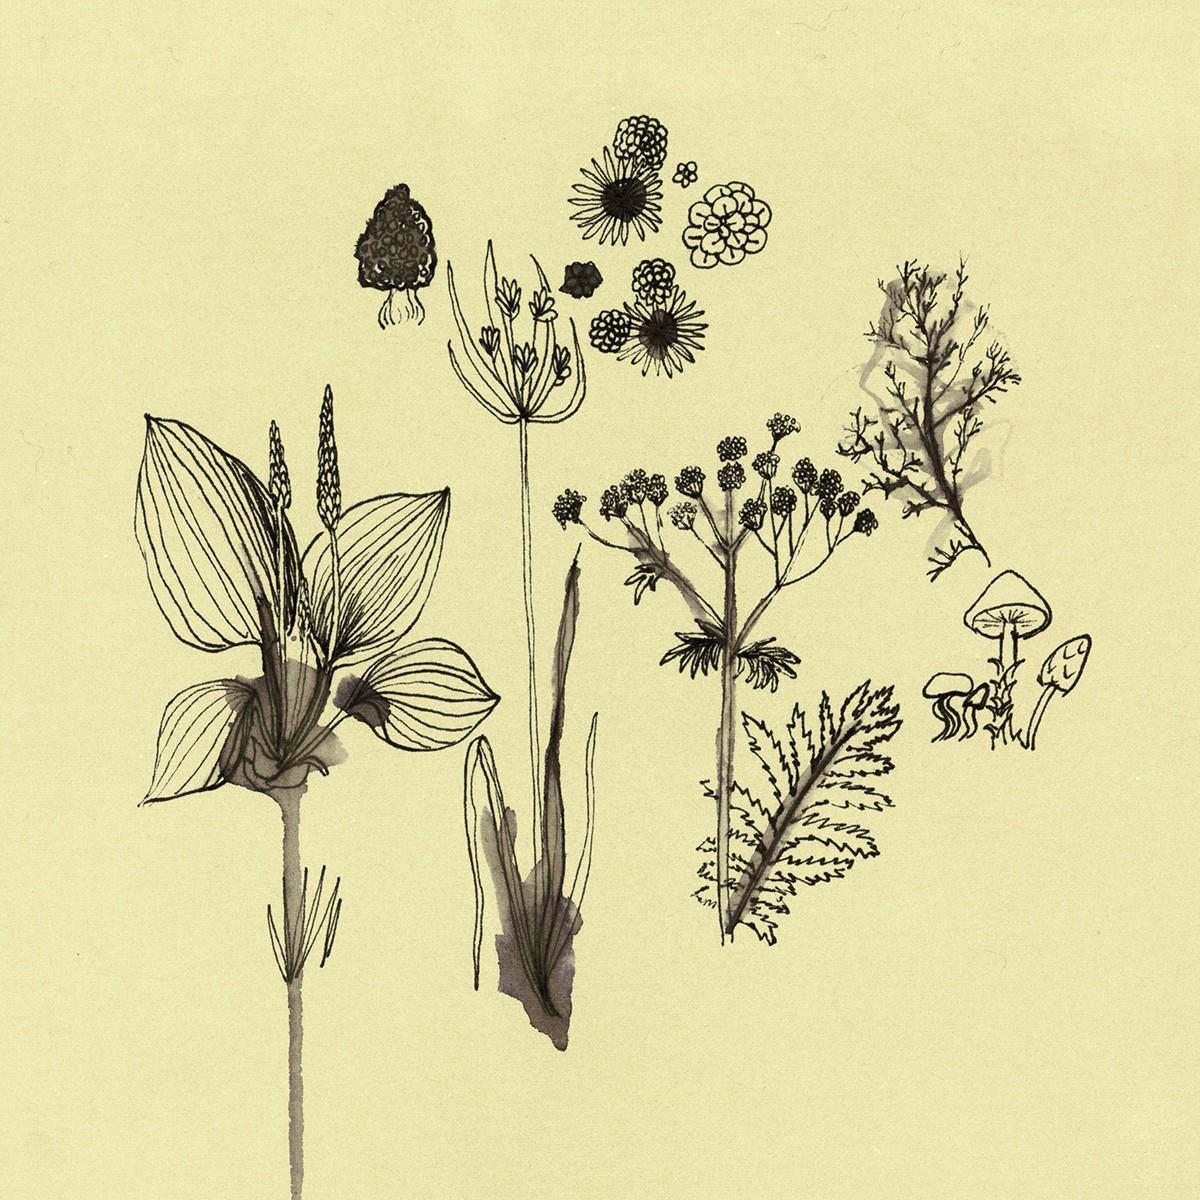 Abstract Plant Drawings By Kiki Bakowski On Behance